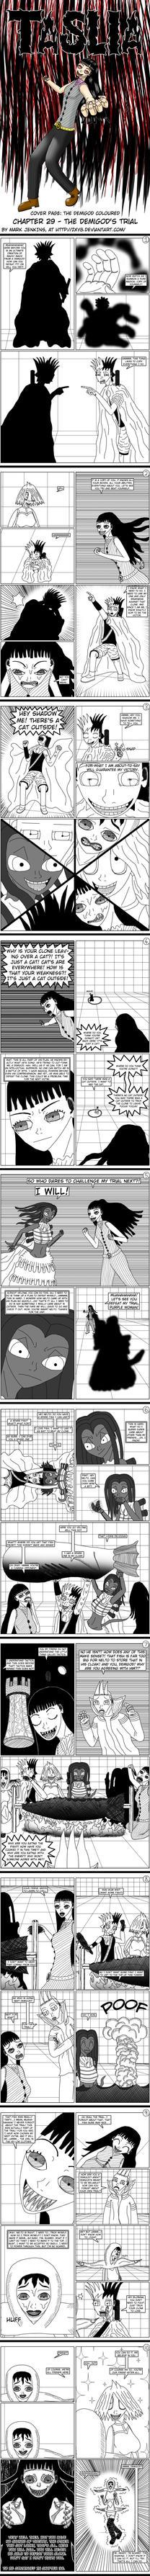 Taslia comic - Chapter 29, by ZXY8 by zxy8